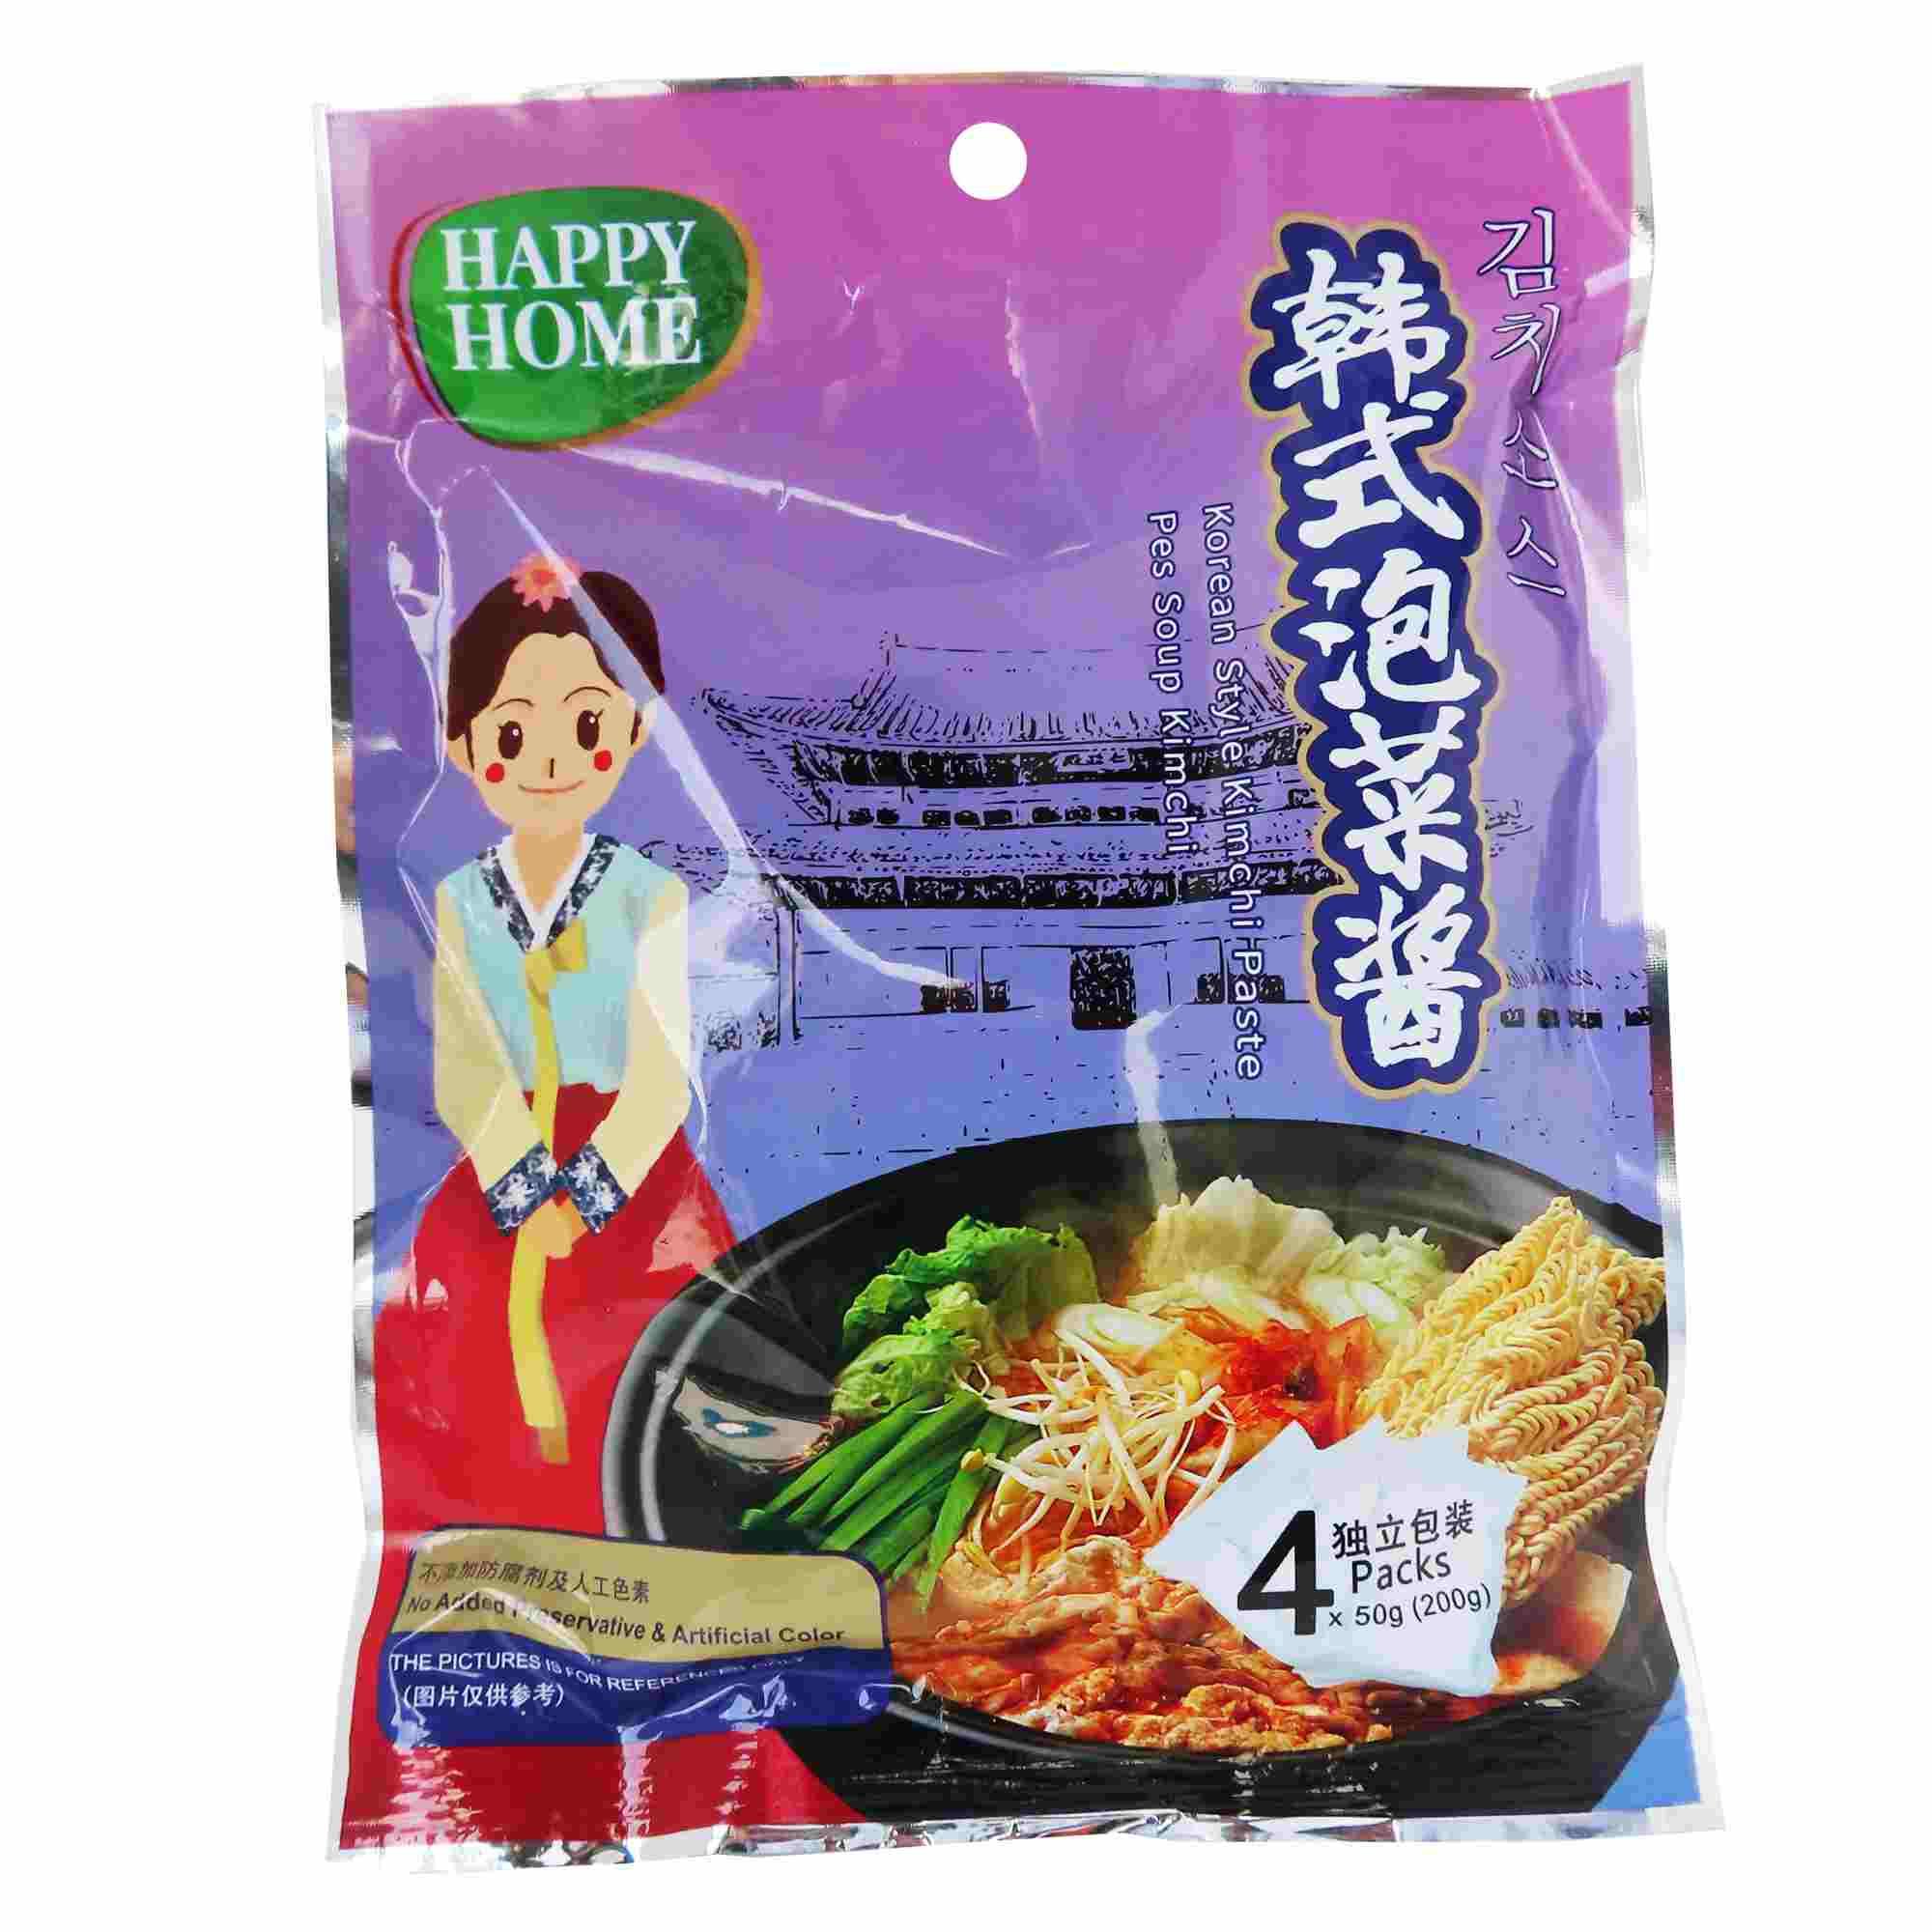 Image Happy Home Korean Style Kimchi Paste 韩式泡菜酱 200grams